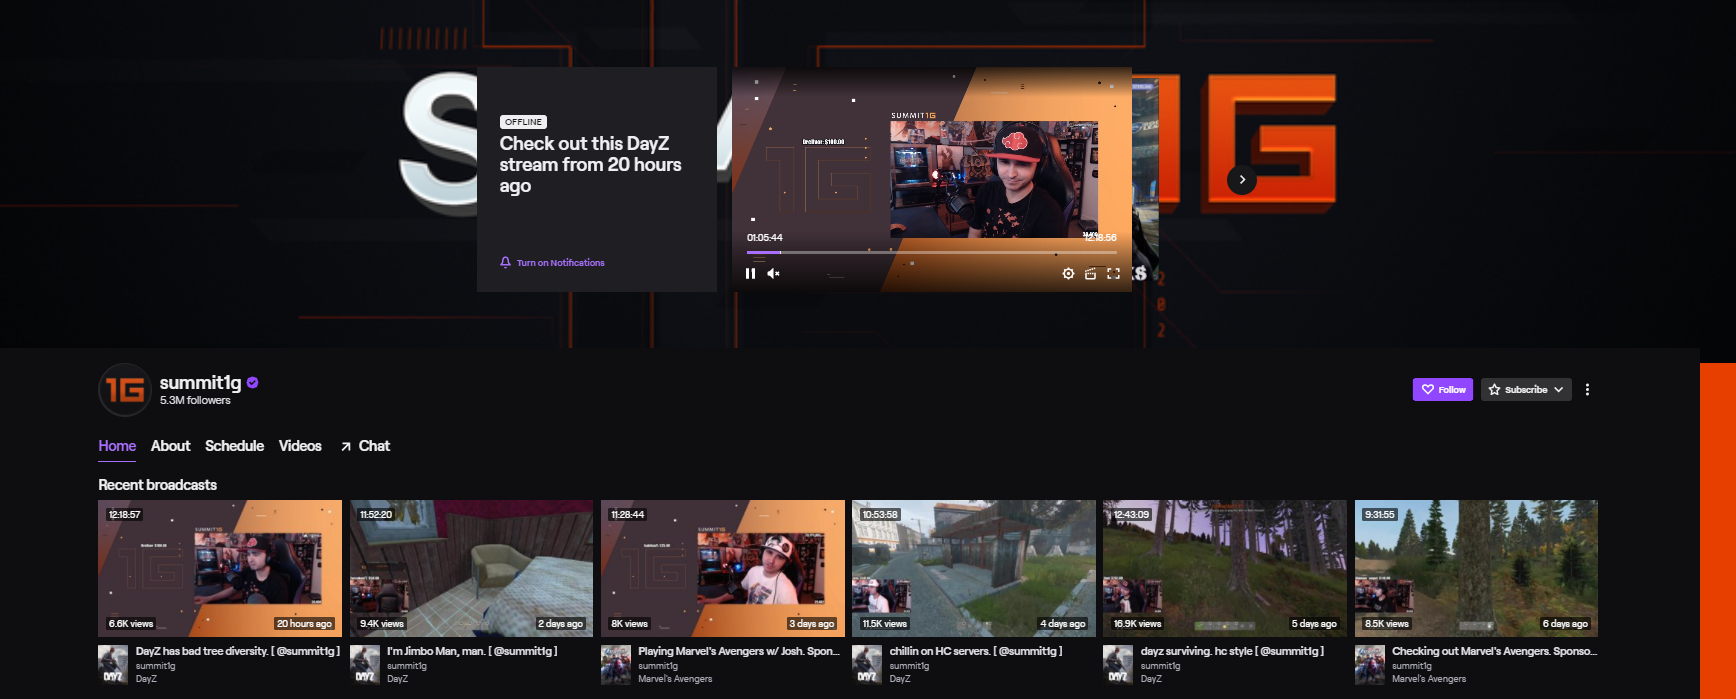 Summit1G top twitch streamers